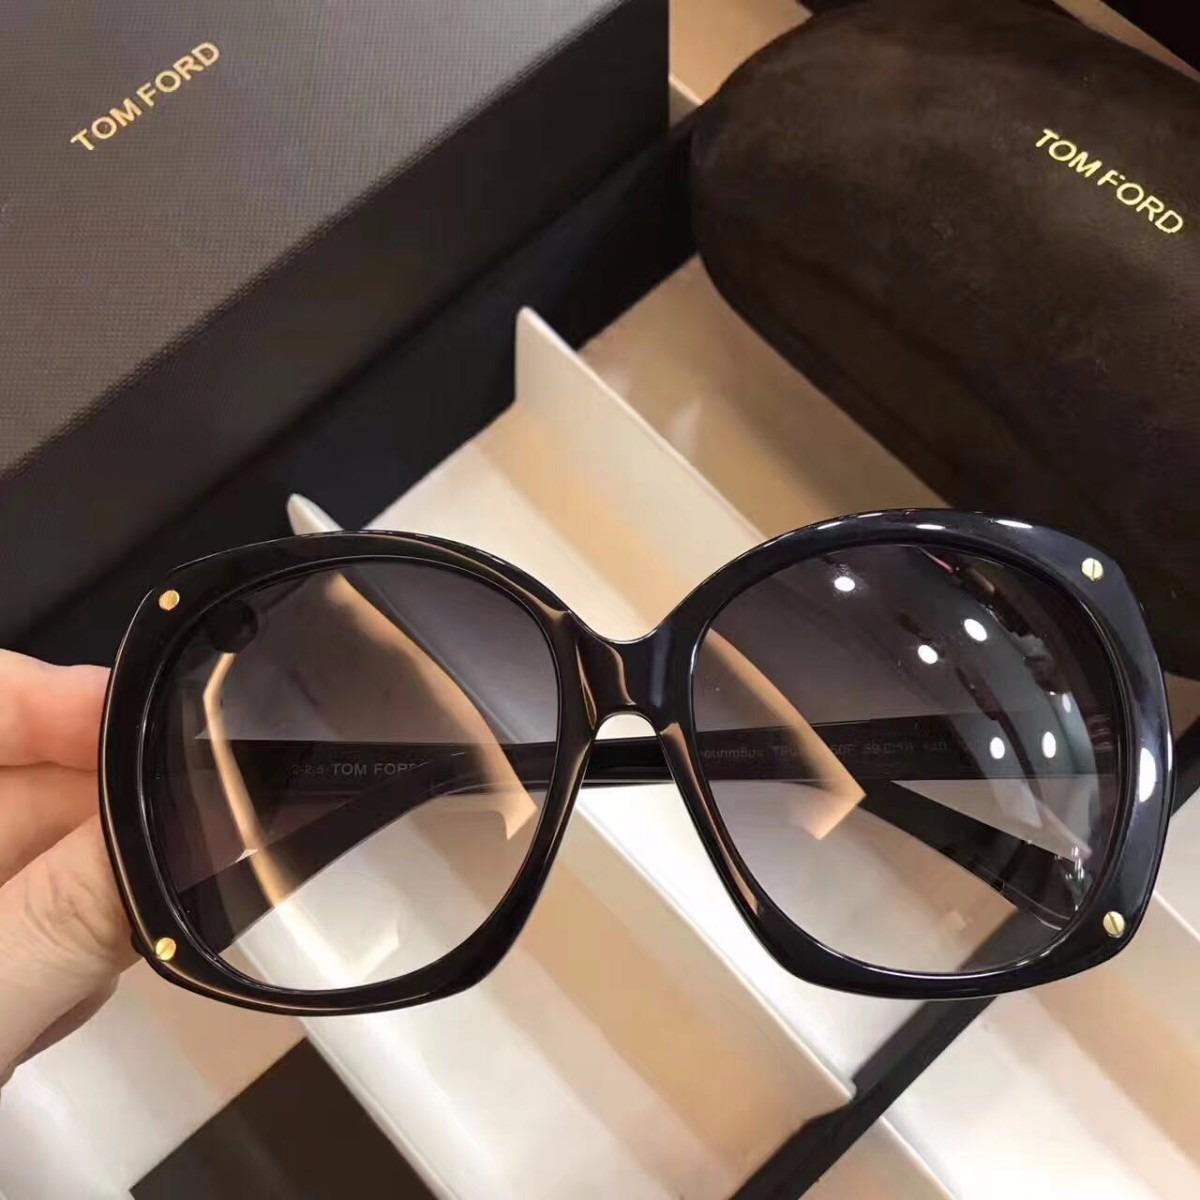 Óculos Sol Tom Ford Geométrica Feminino Frete Grátis - R  399,00 em ... 47d535d7c5